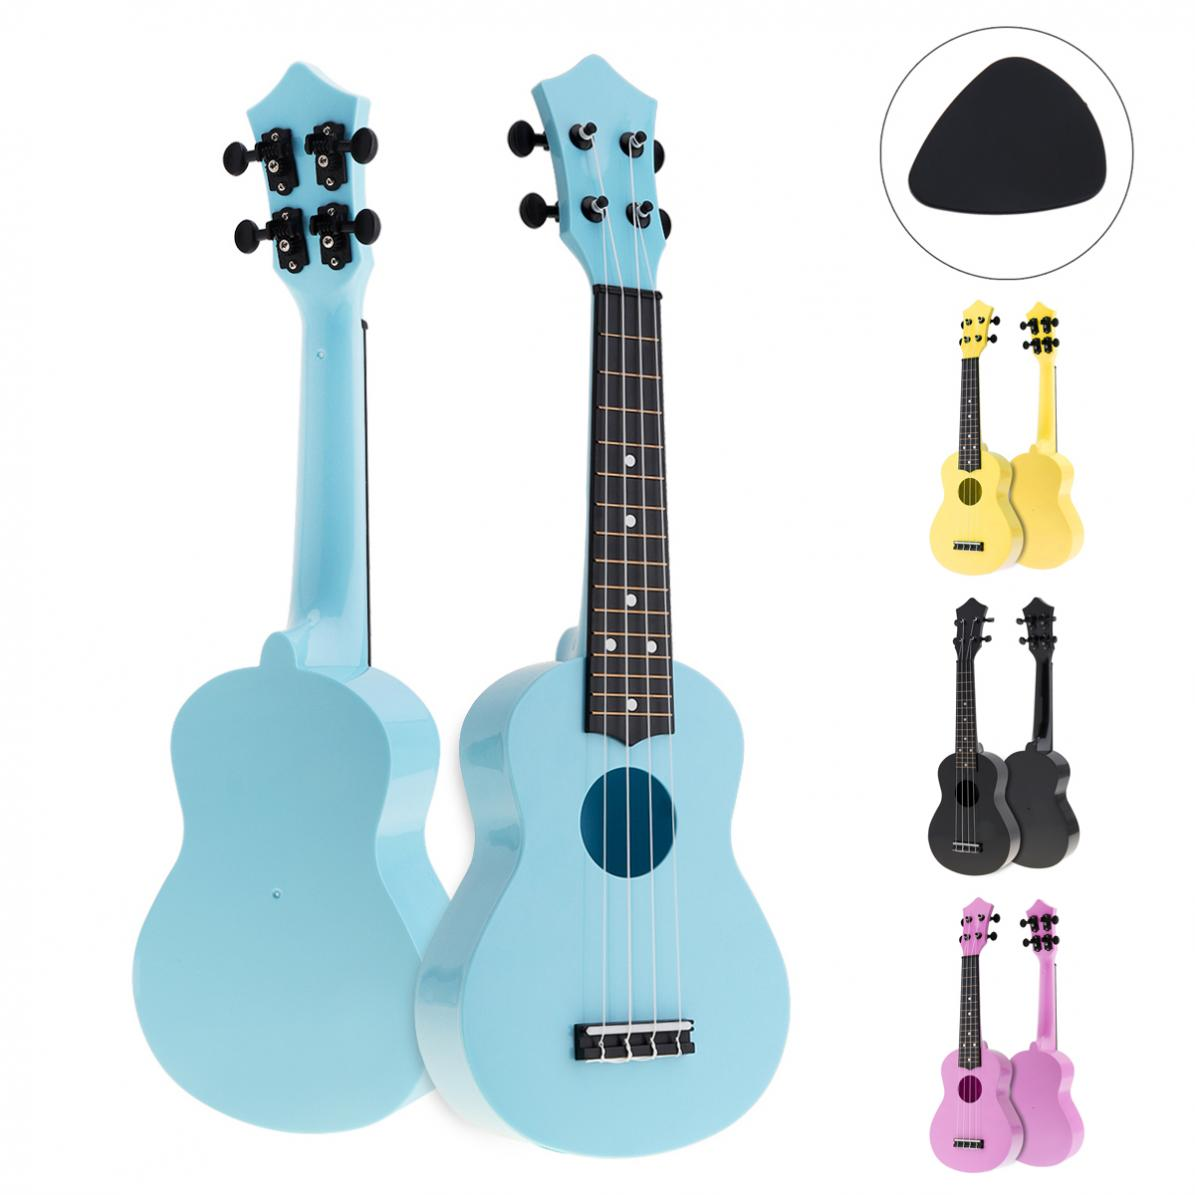 21 Inch Colorful Acoustic Ukulele Uke 4 Strings Hawaii Guitar Guitarra Musica Instrument For Kids And Music Beginner